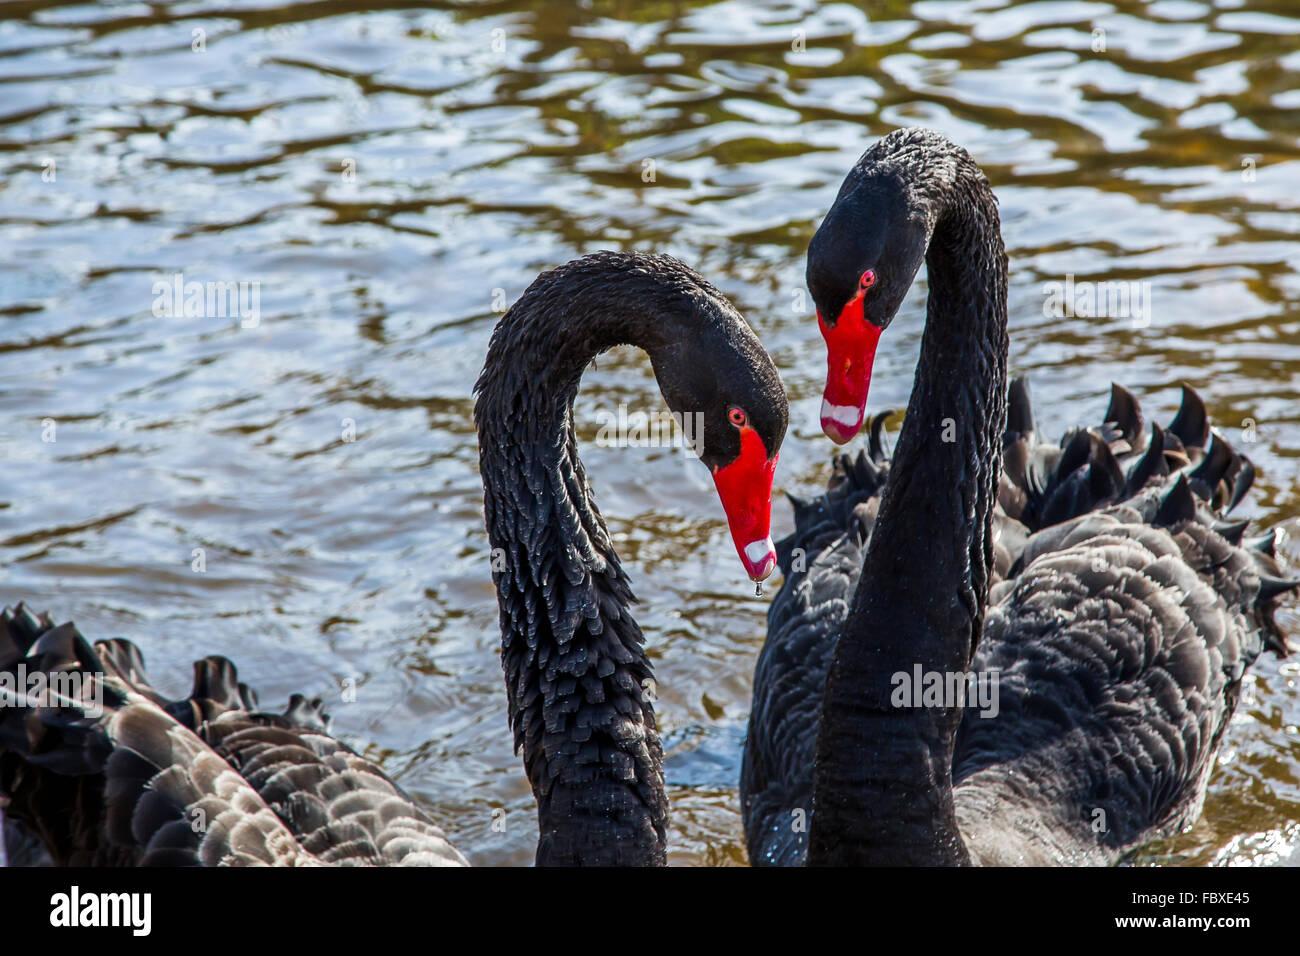 A pair of Black swan Cygnus atratus on Dawlish Brook at Dawlish, Devon, England UK - Stock Image